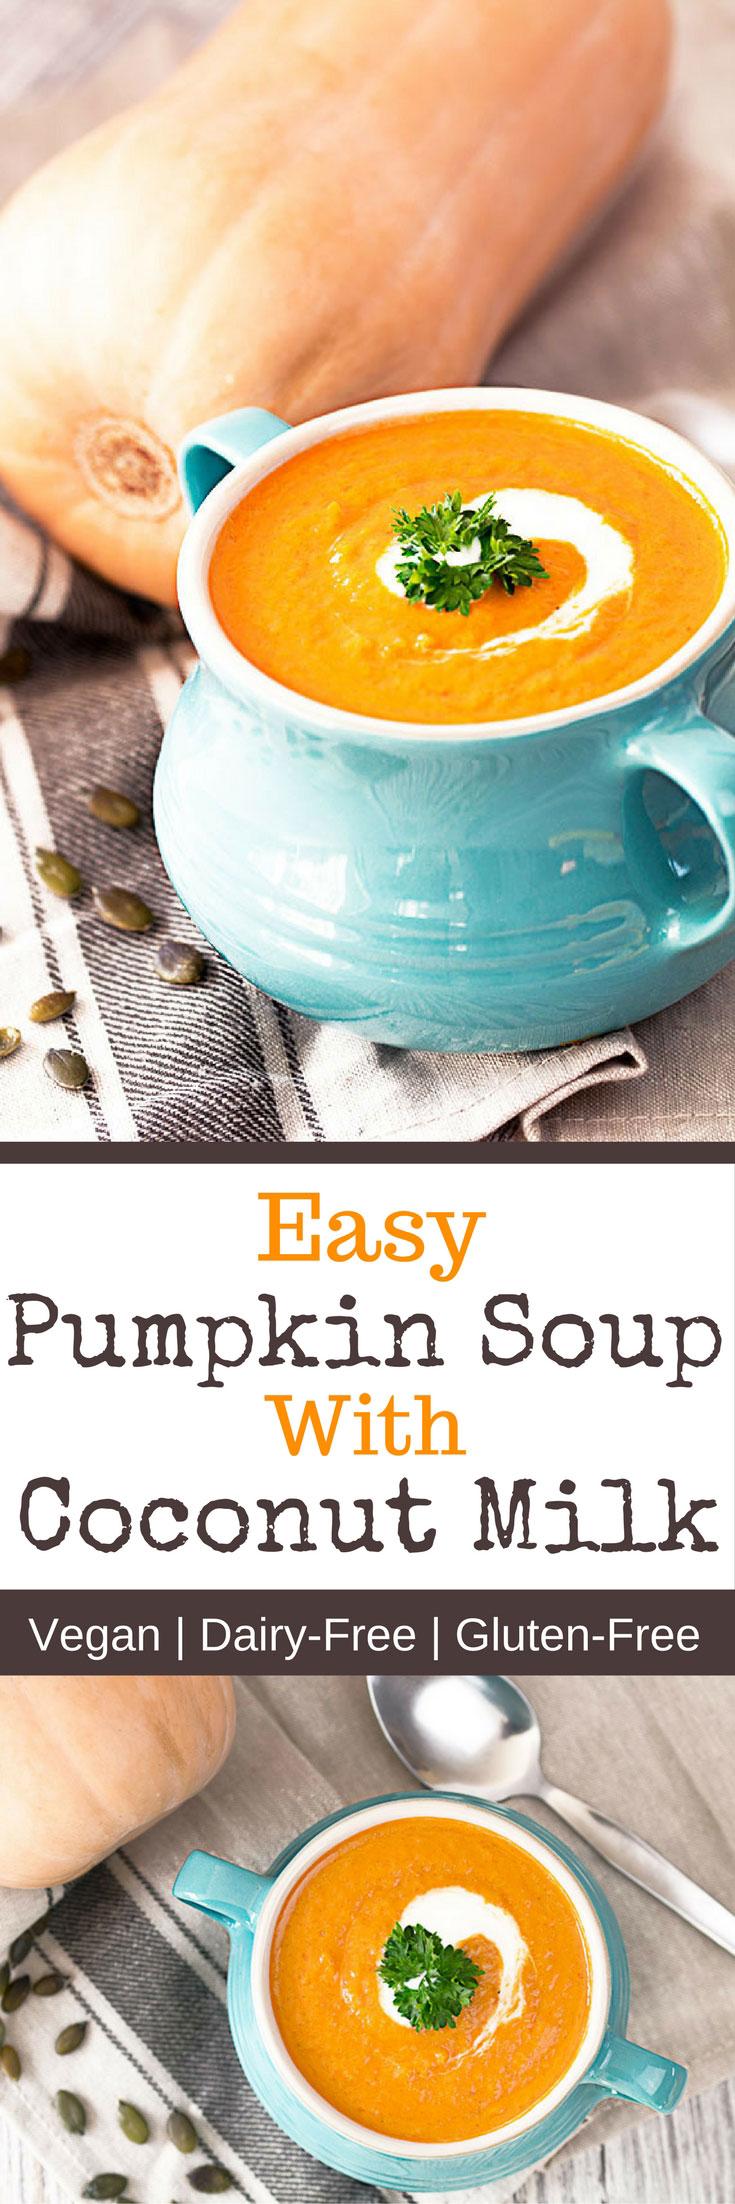 Easy Pumpkin Soup With Coconut Milk Recipe - The Healthy Tart